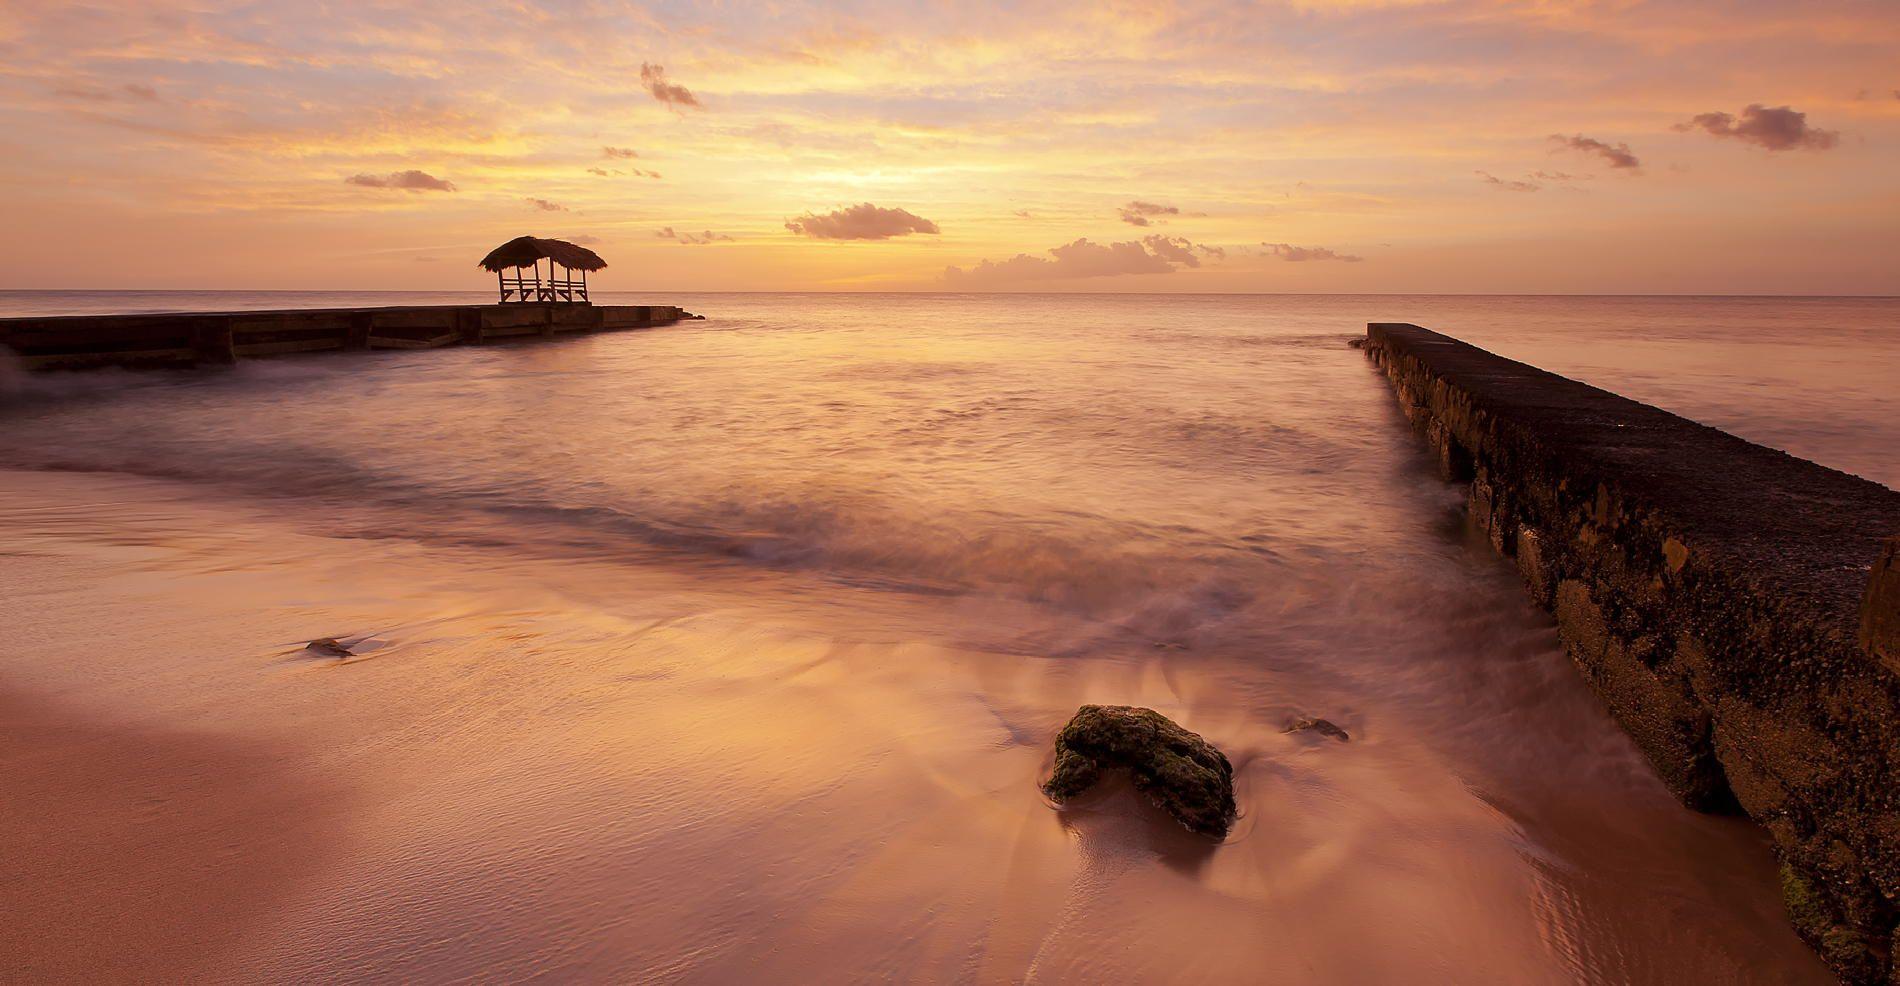 Tobago - Caribbean by Peter Krocka on 500px